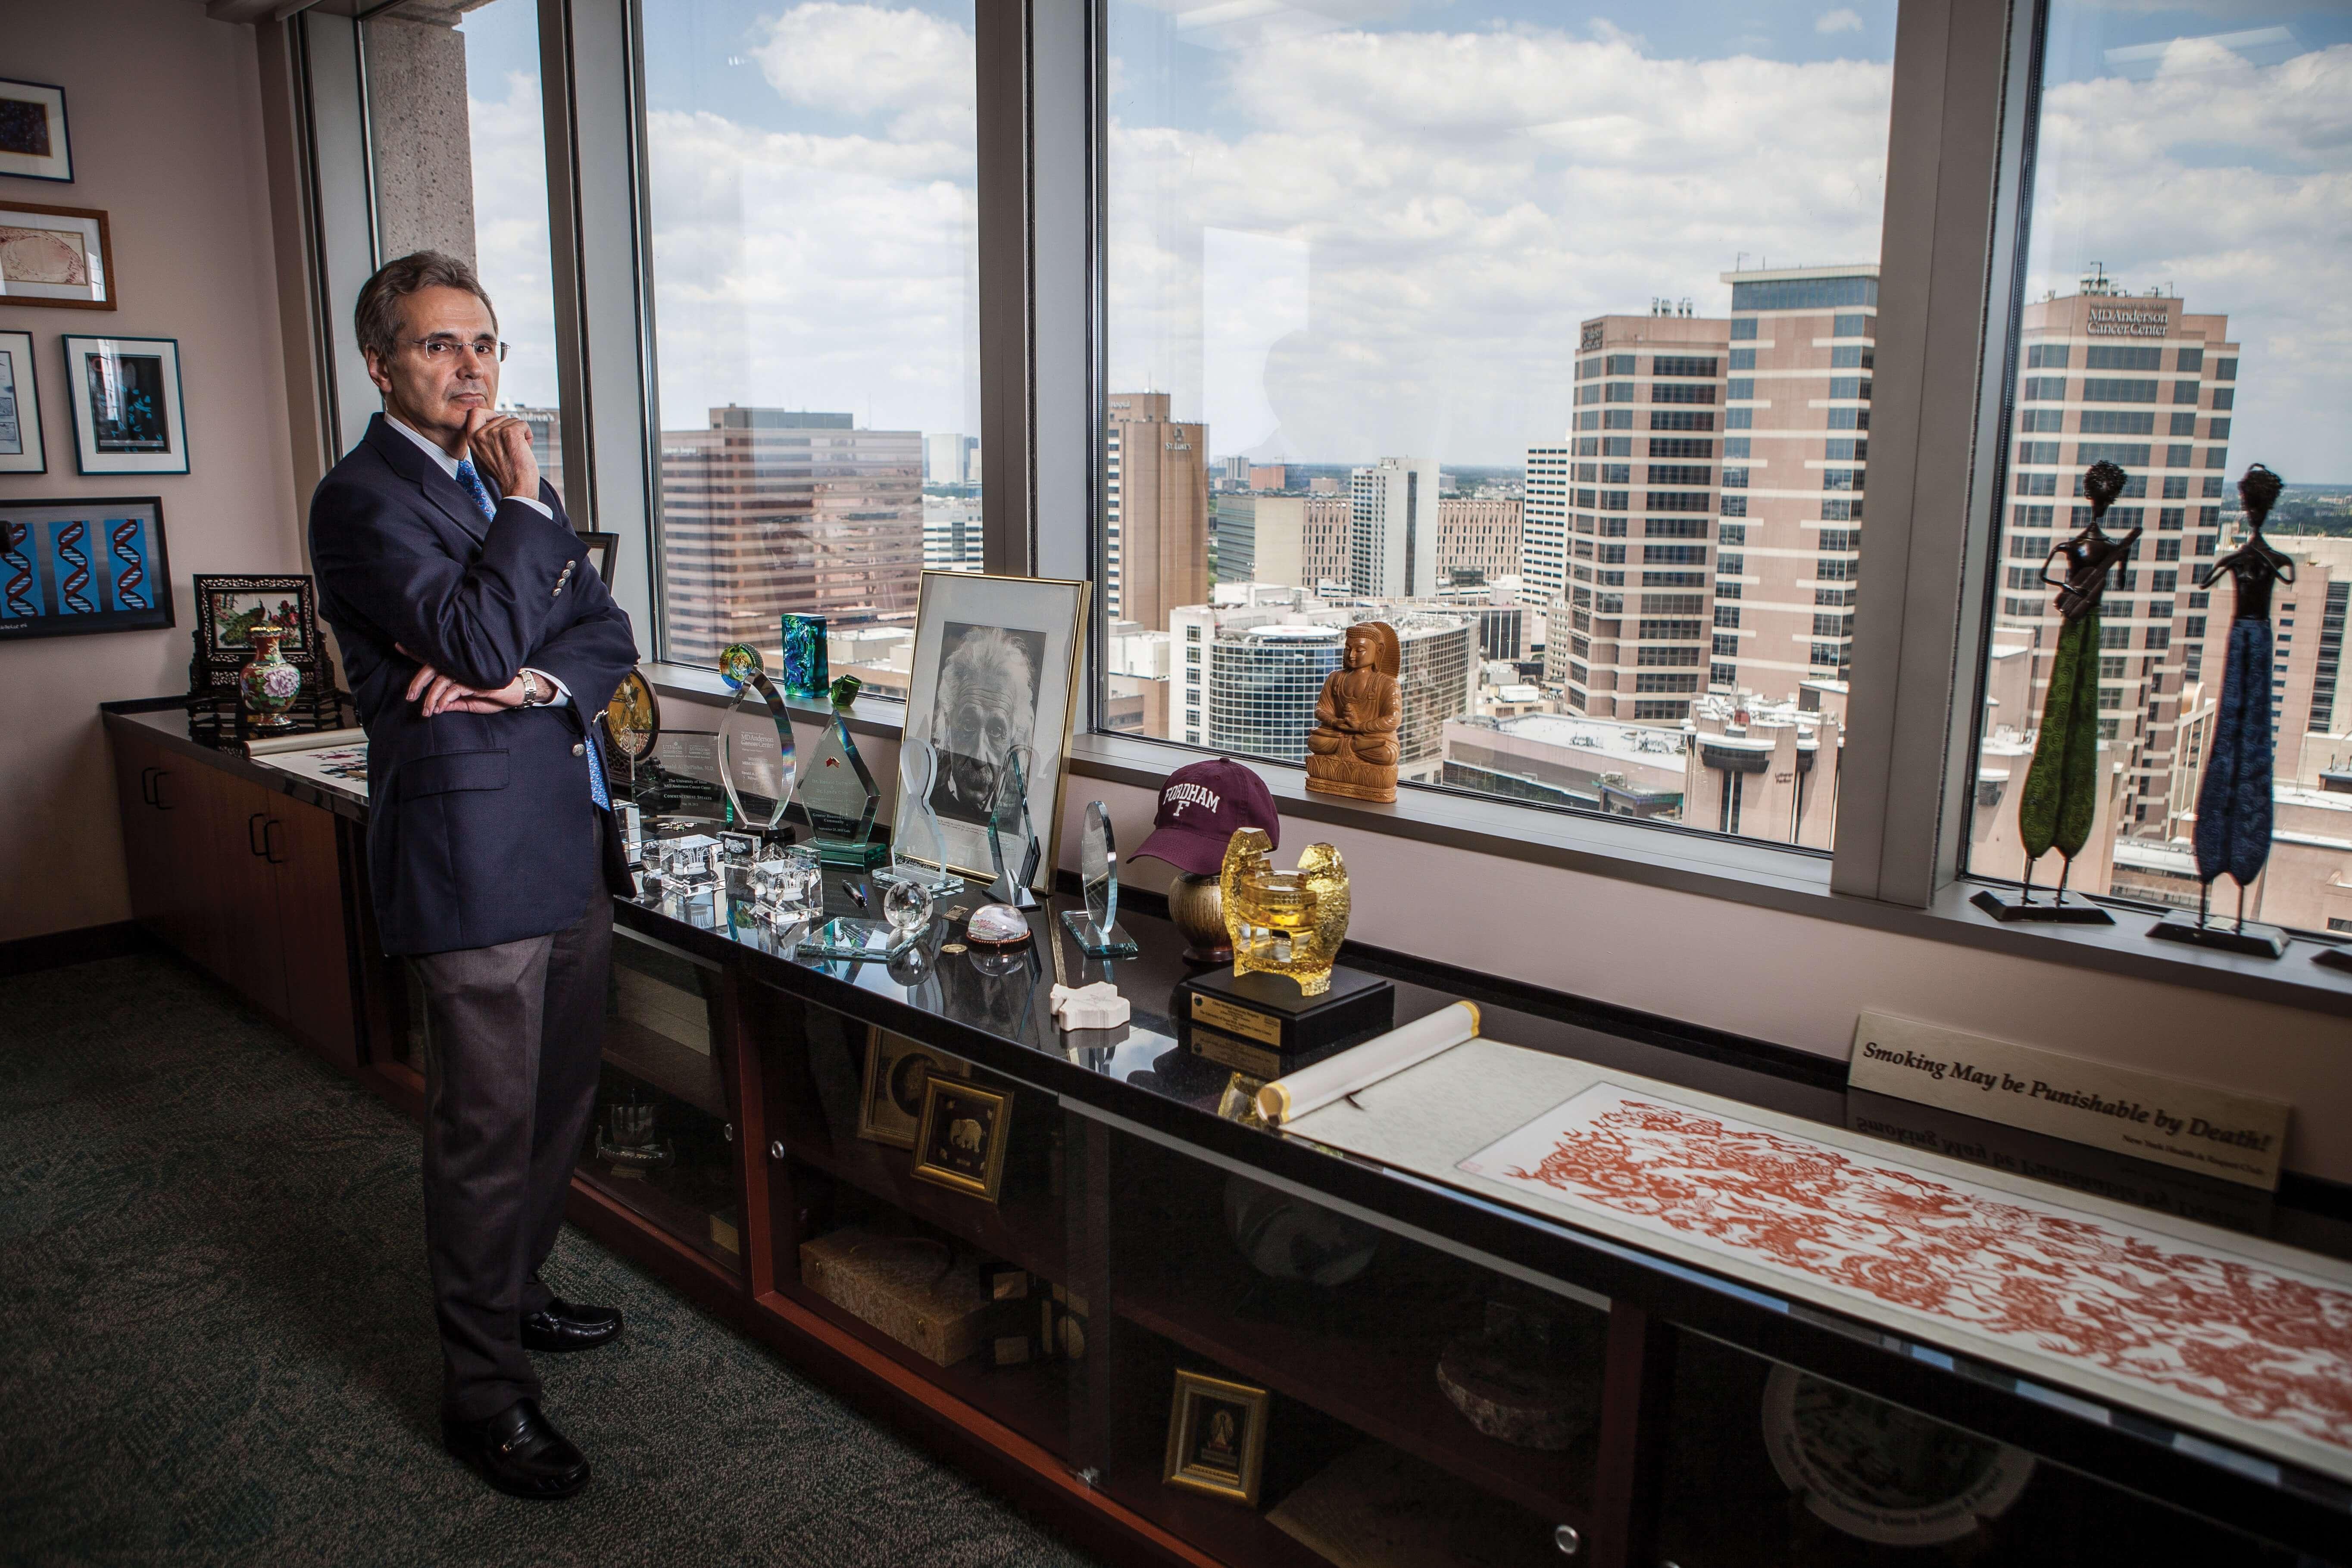 Ronald A. DePinho, M.D., President of the University of Texas MD Anderson Cancer Center (Credit: Nick de la Torre)